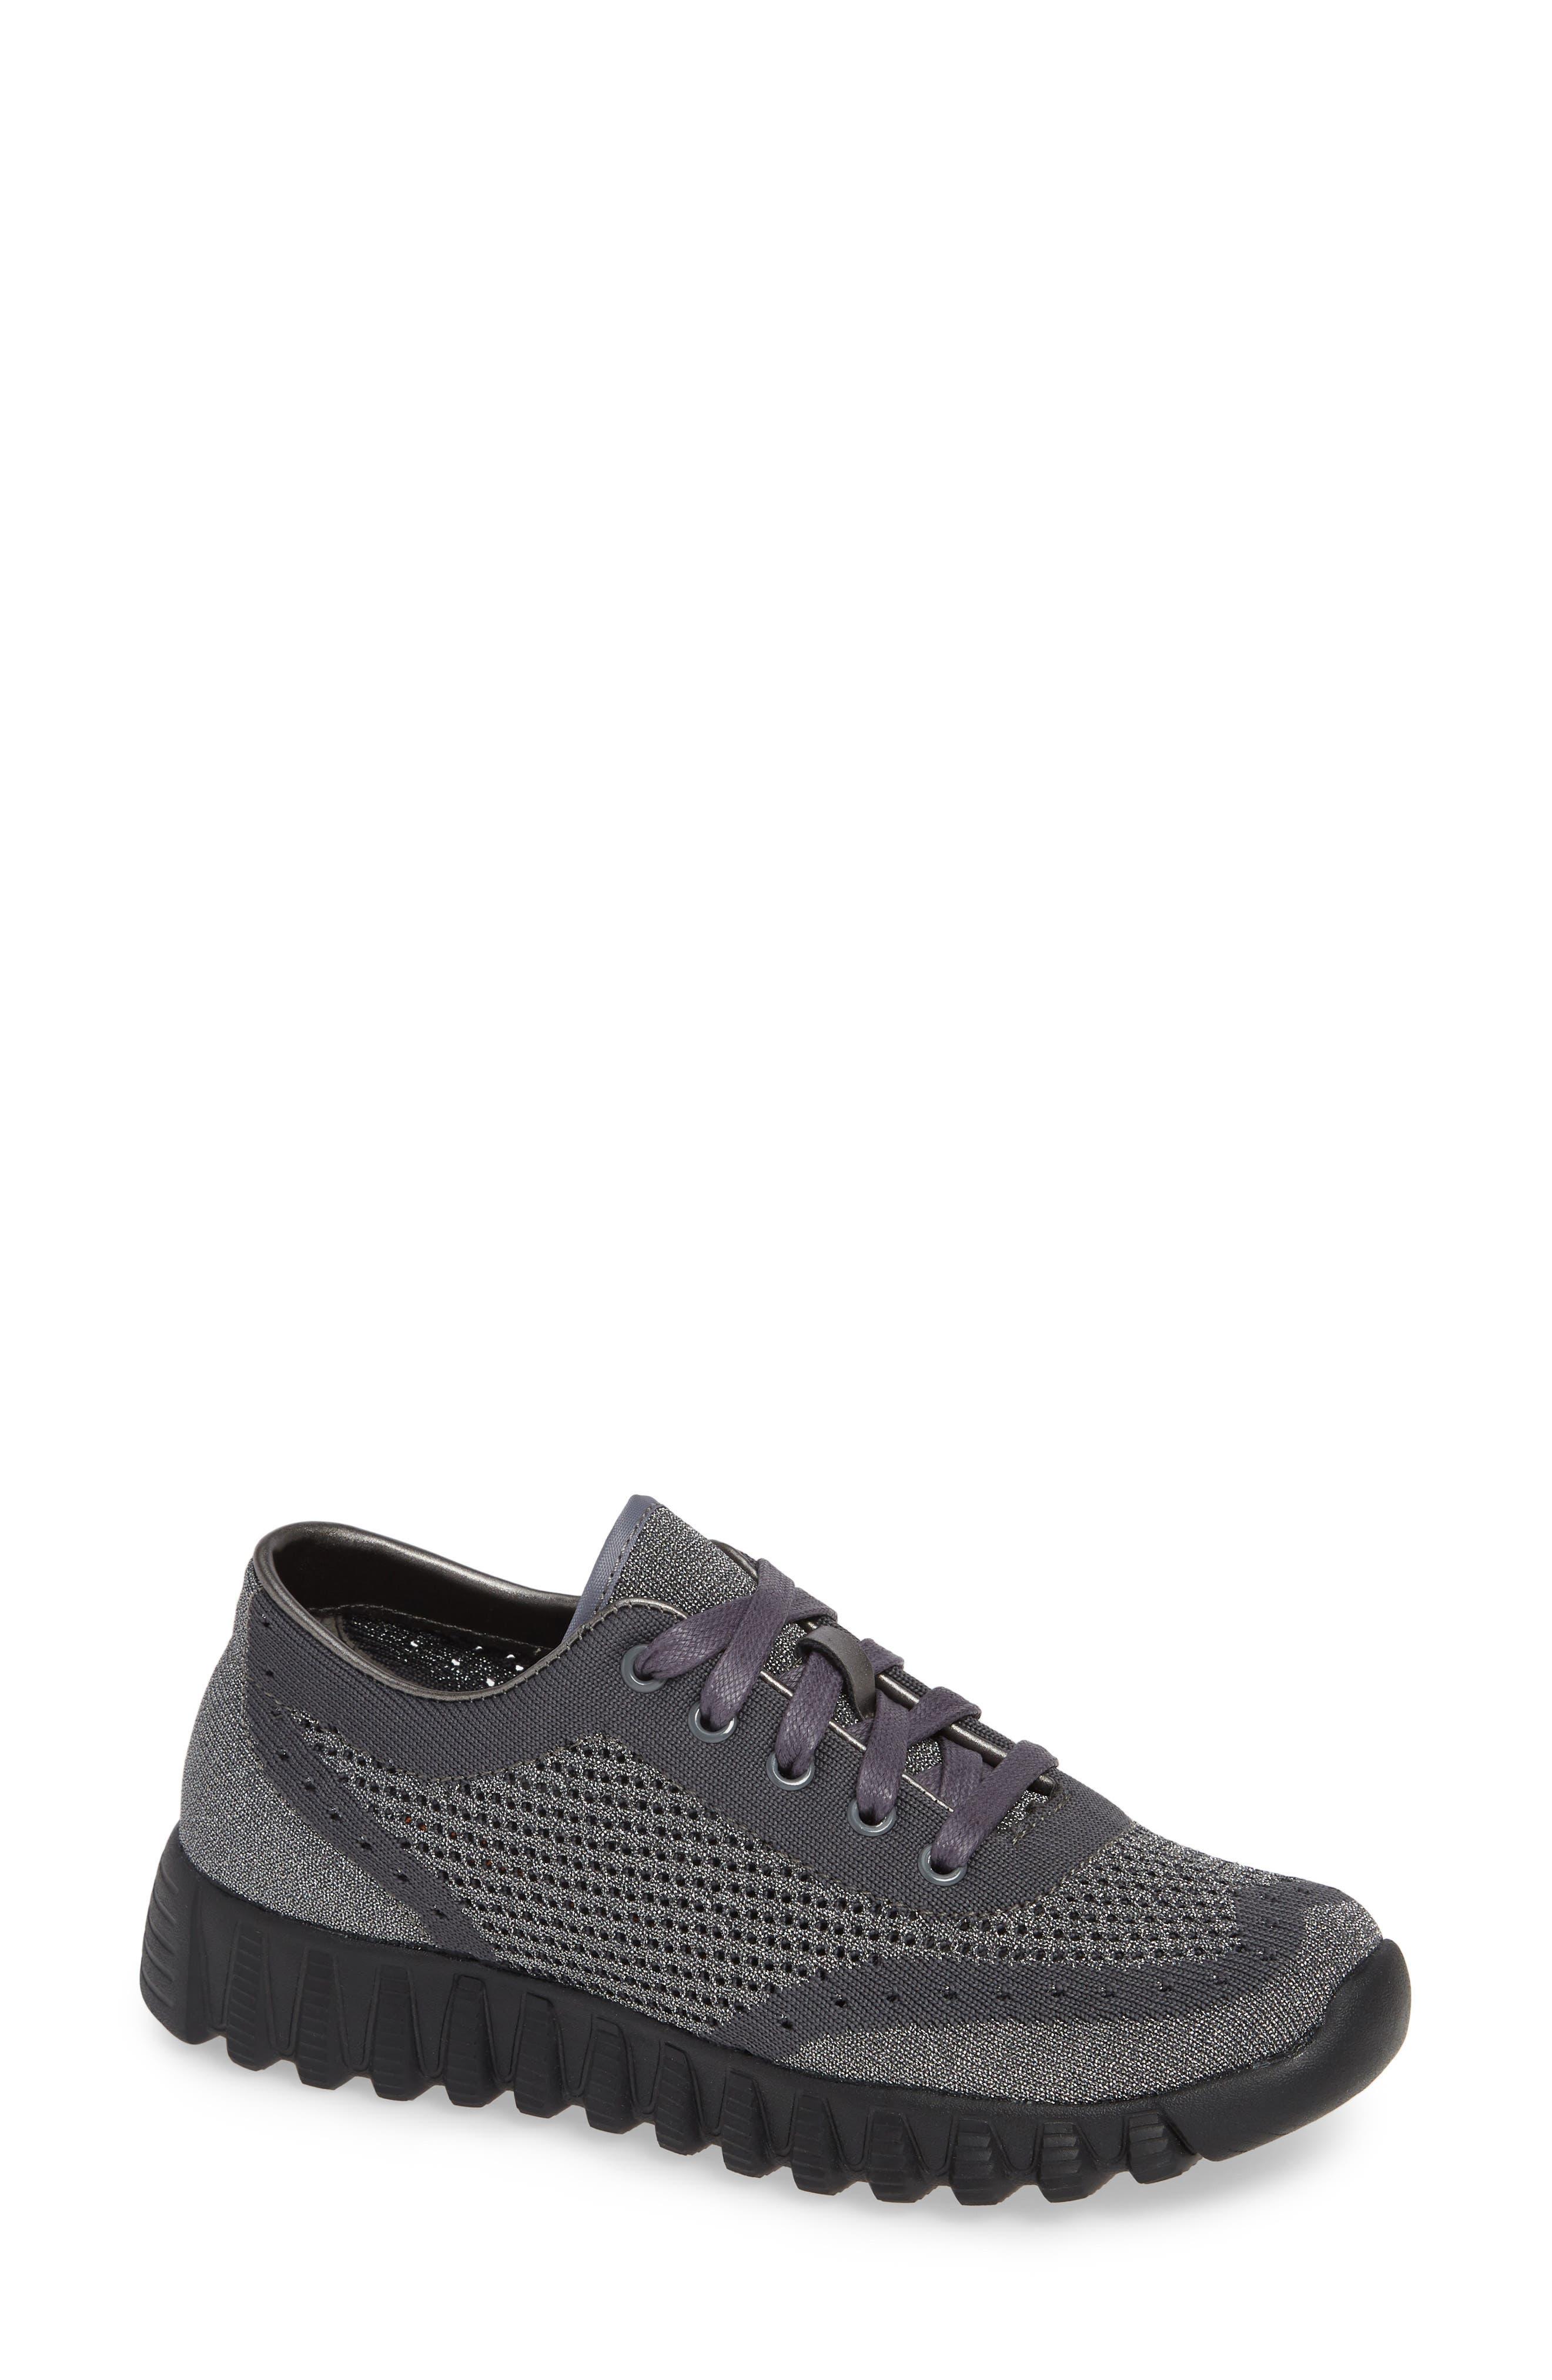 Bernie Mev Amit Sneaker, Grey